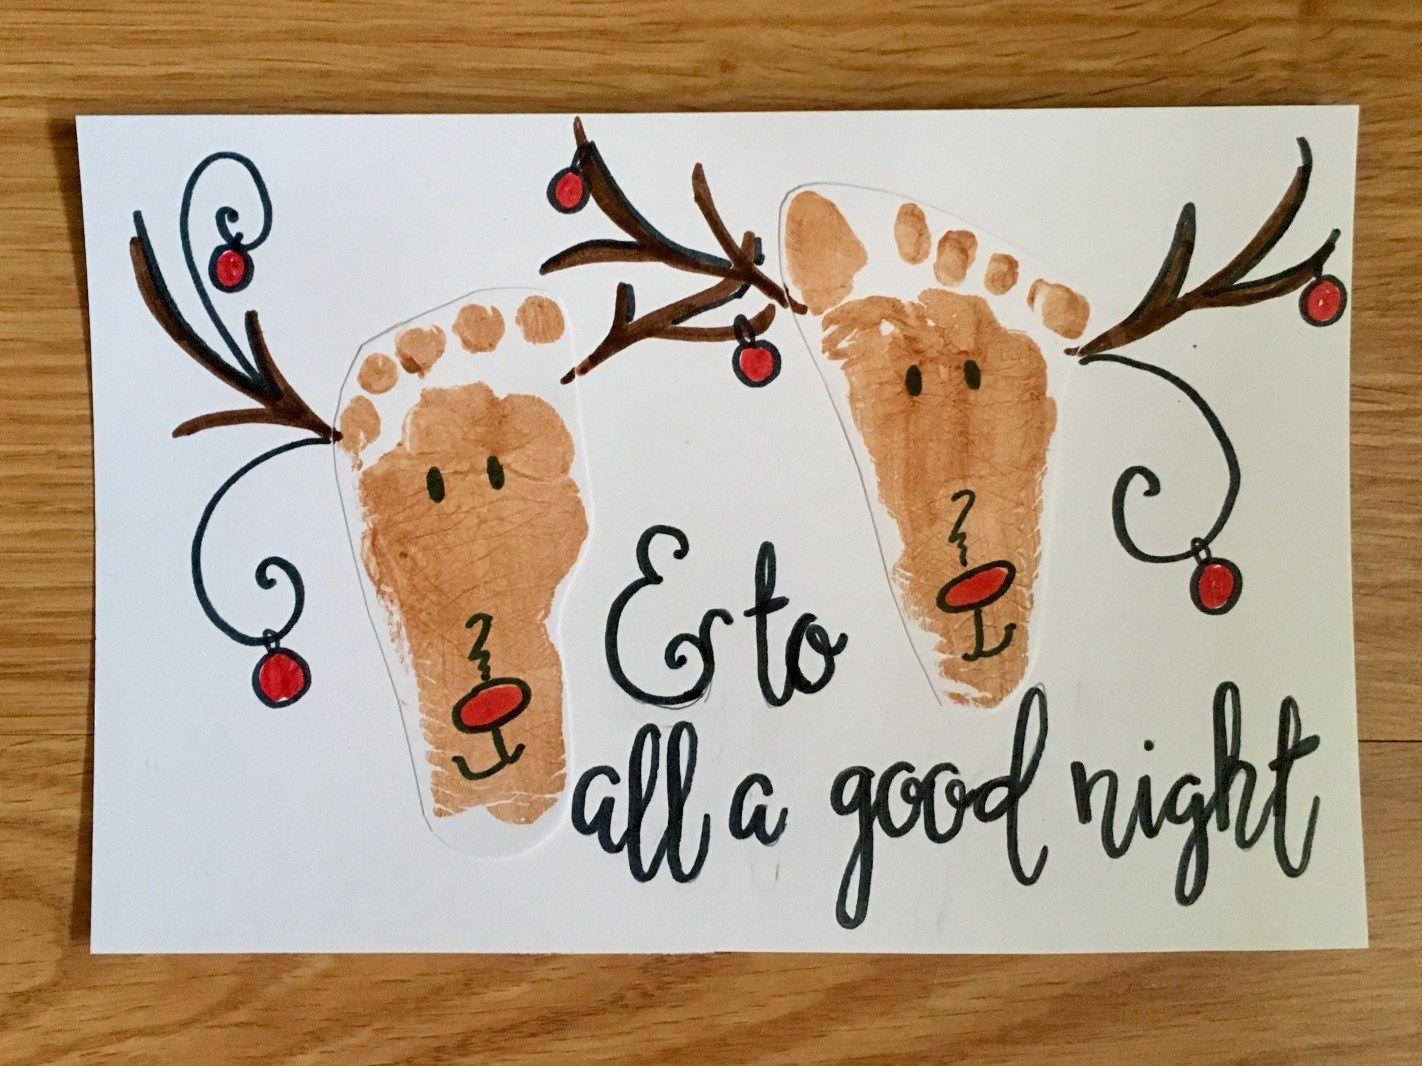 Christmas footprint crafts: perfect Christmas art for lifelong mementos. Mice, reindeer, mistletoe & Christmas tree footprint keepsakes for baby's first Chr #mistletoesfootprintcraft